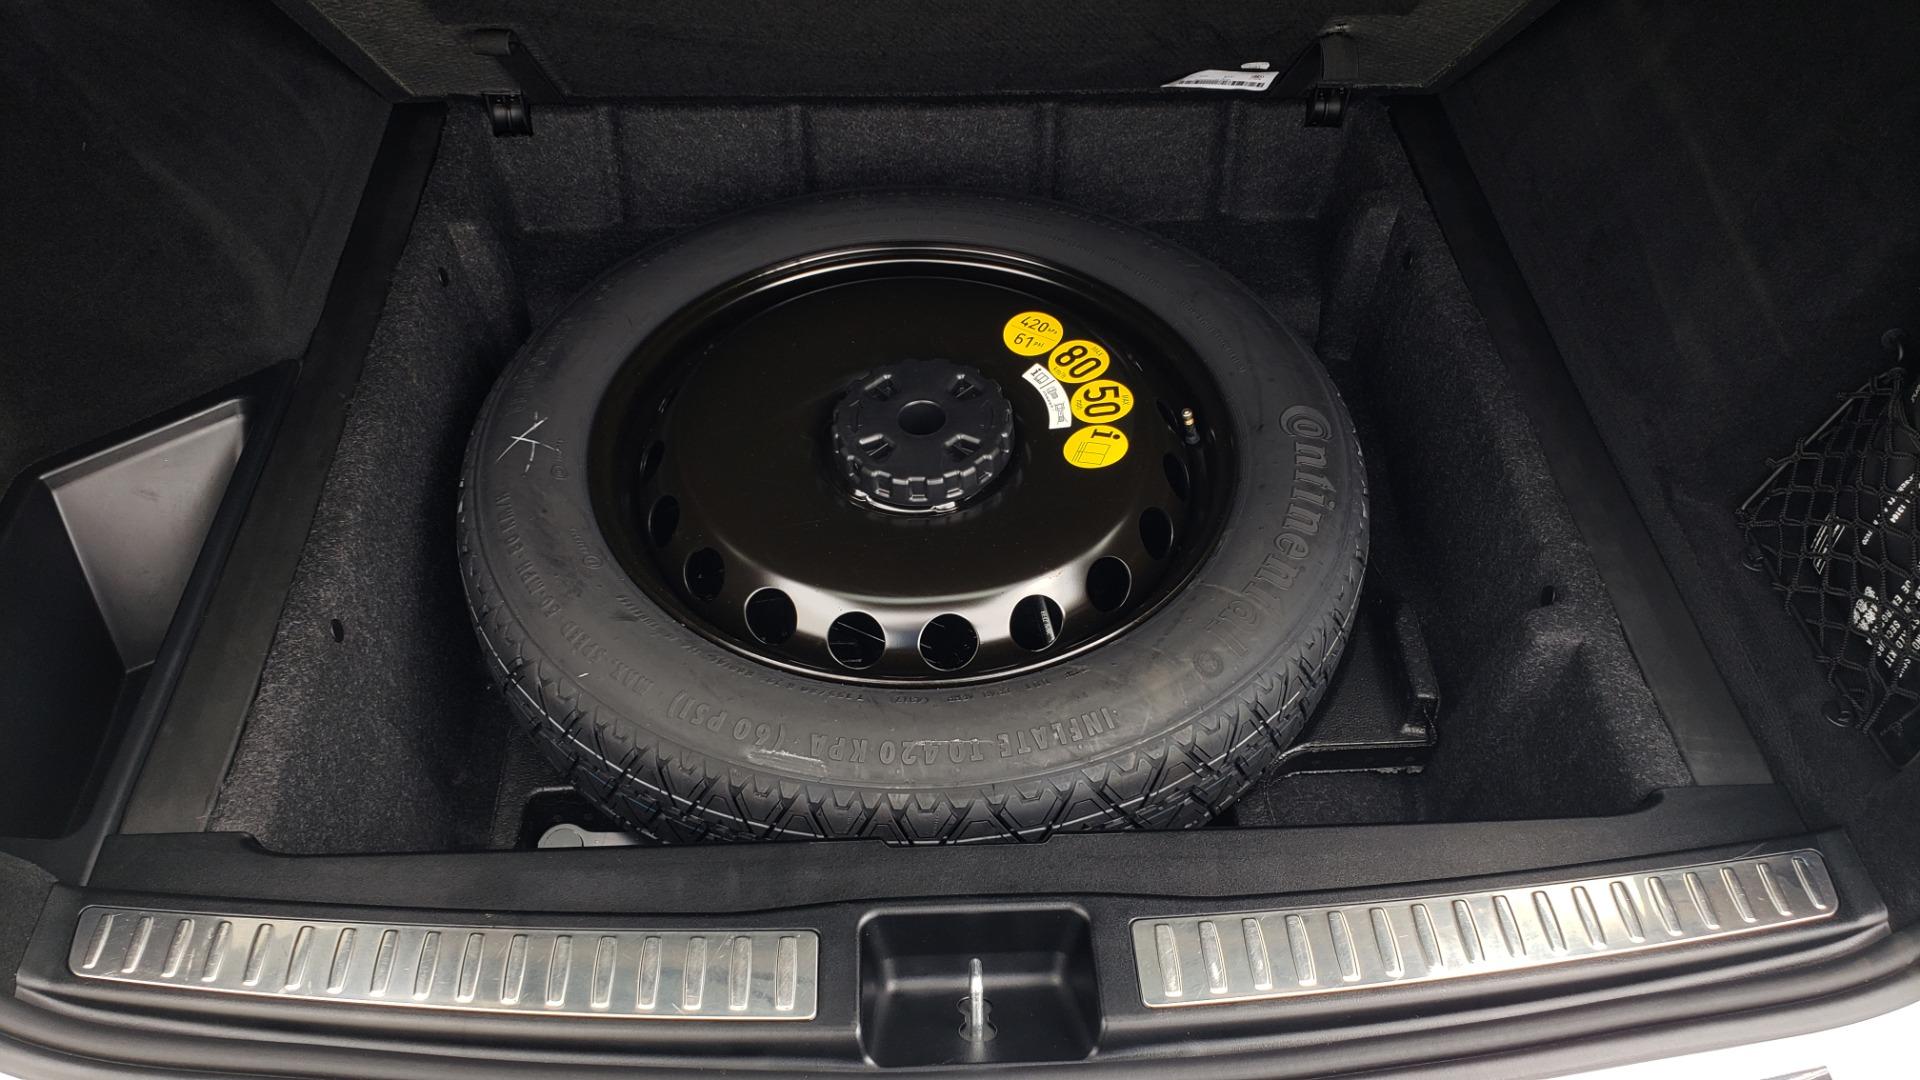 Used 2018 Mercedes-Benz GLE 350 4MATIC / PREM PKG / NAV / PARK ASST / K/H SND / HITCH / REARVIEW for sale $40,801 at Formula Imports in Charlotte NC 28227 20